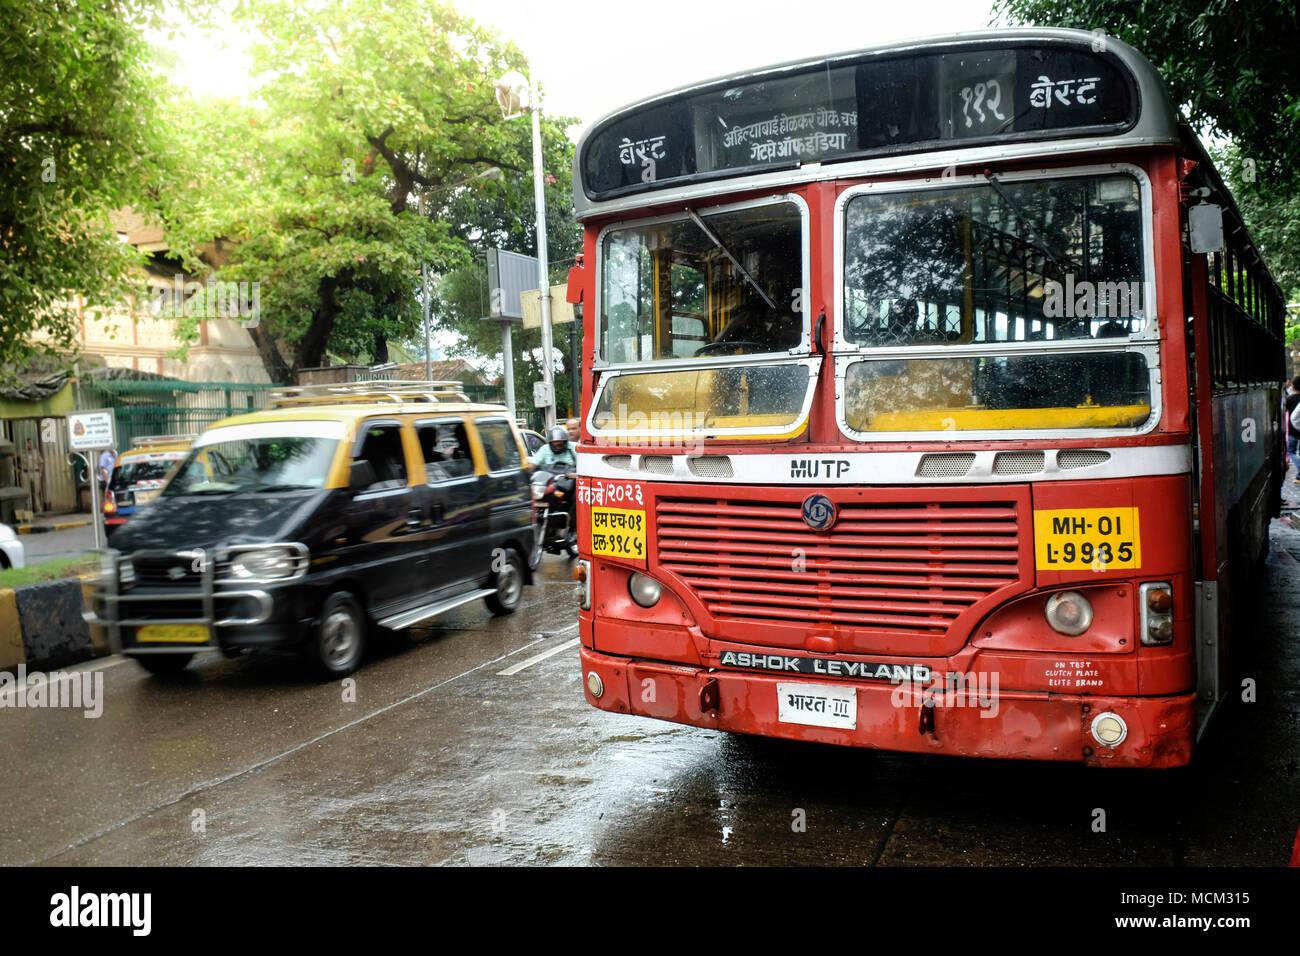 A Brihanmumbai Electricity Supply and Transport (BEST) Ashok Leyland local bus parked at Nariman point, Colaba, Mumbai - Stock Image